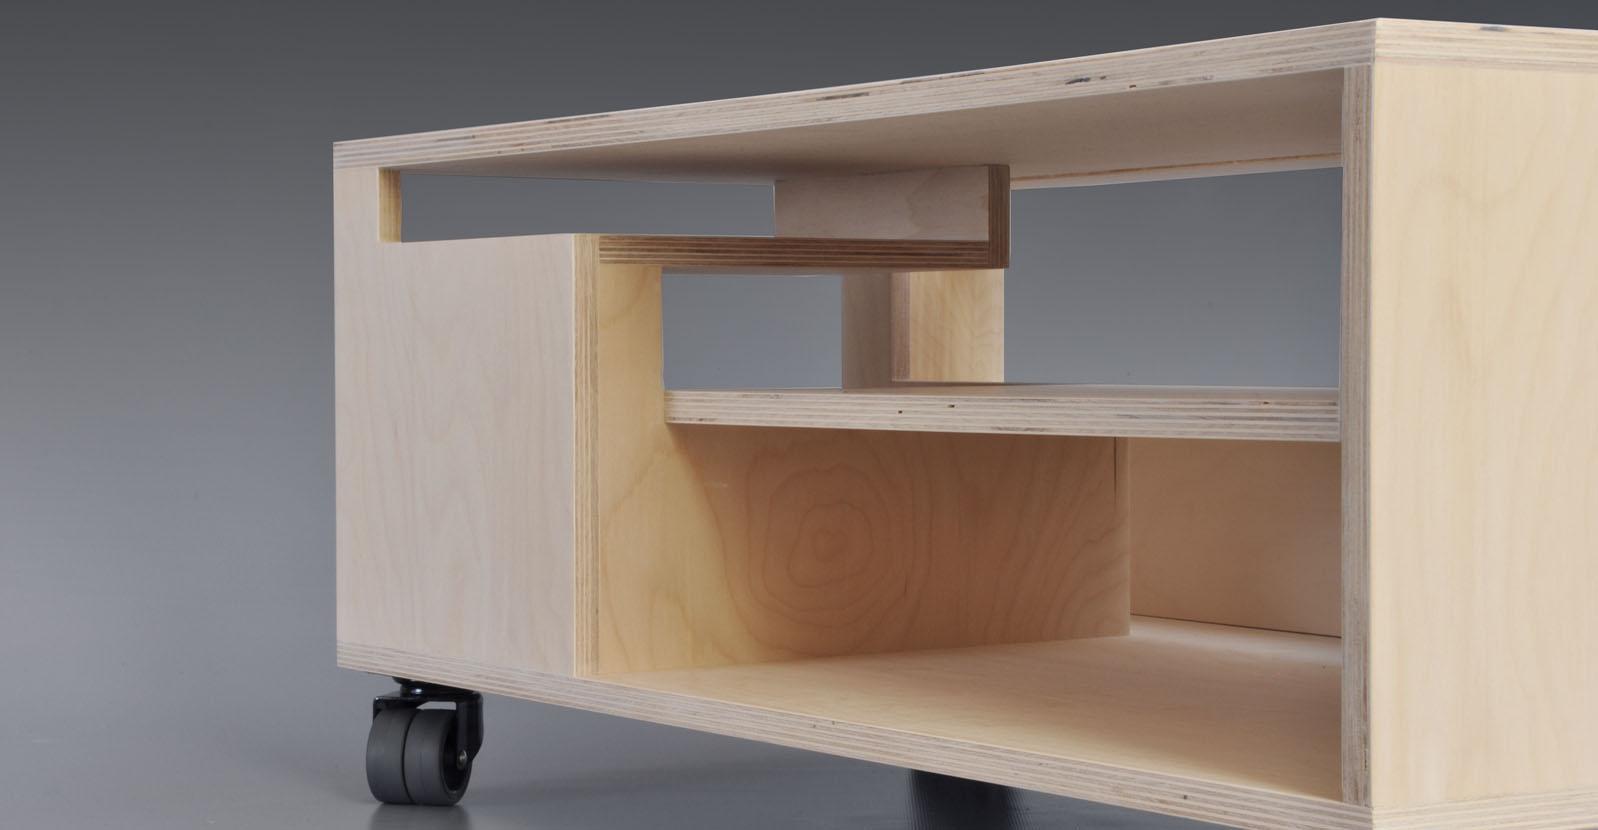 Kleine Tv Meubel : Thomas durner works klein tv meubel met perspectief